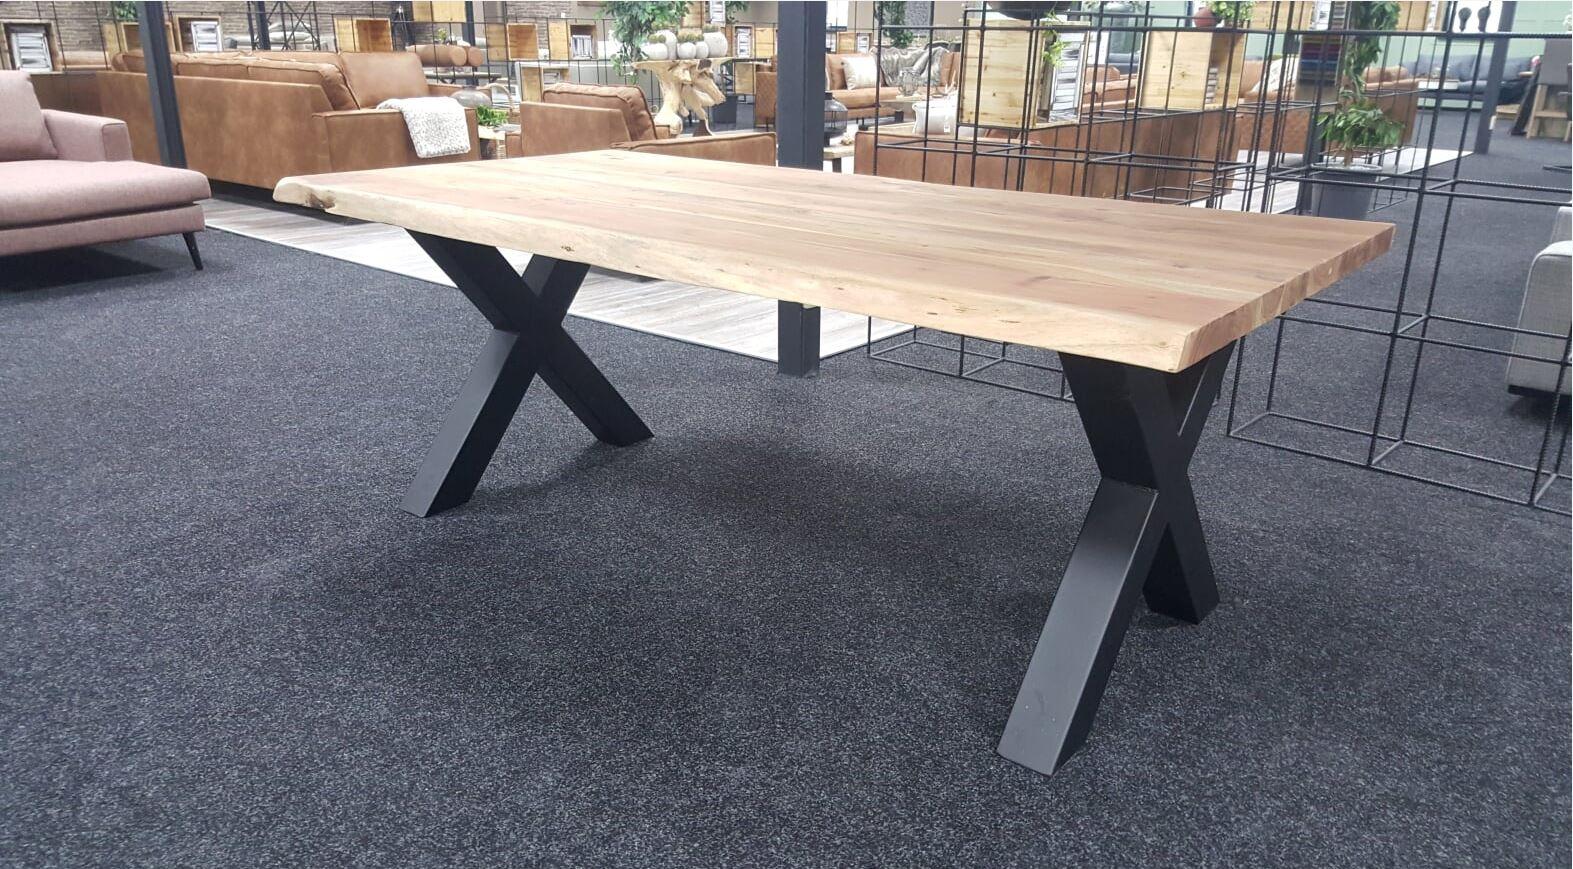 Tafel Van Boomstam : Groot aanbod boomstam tafels acacia hout aktie wonen